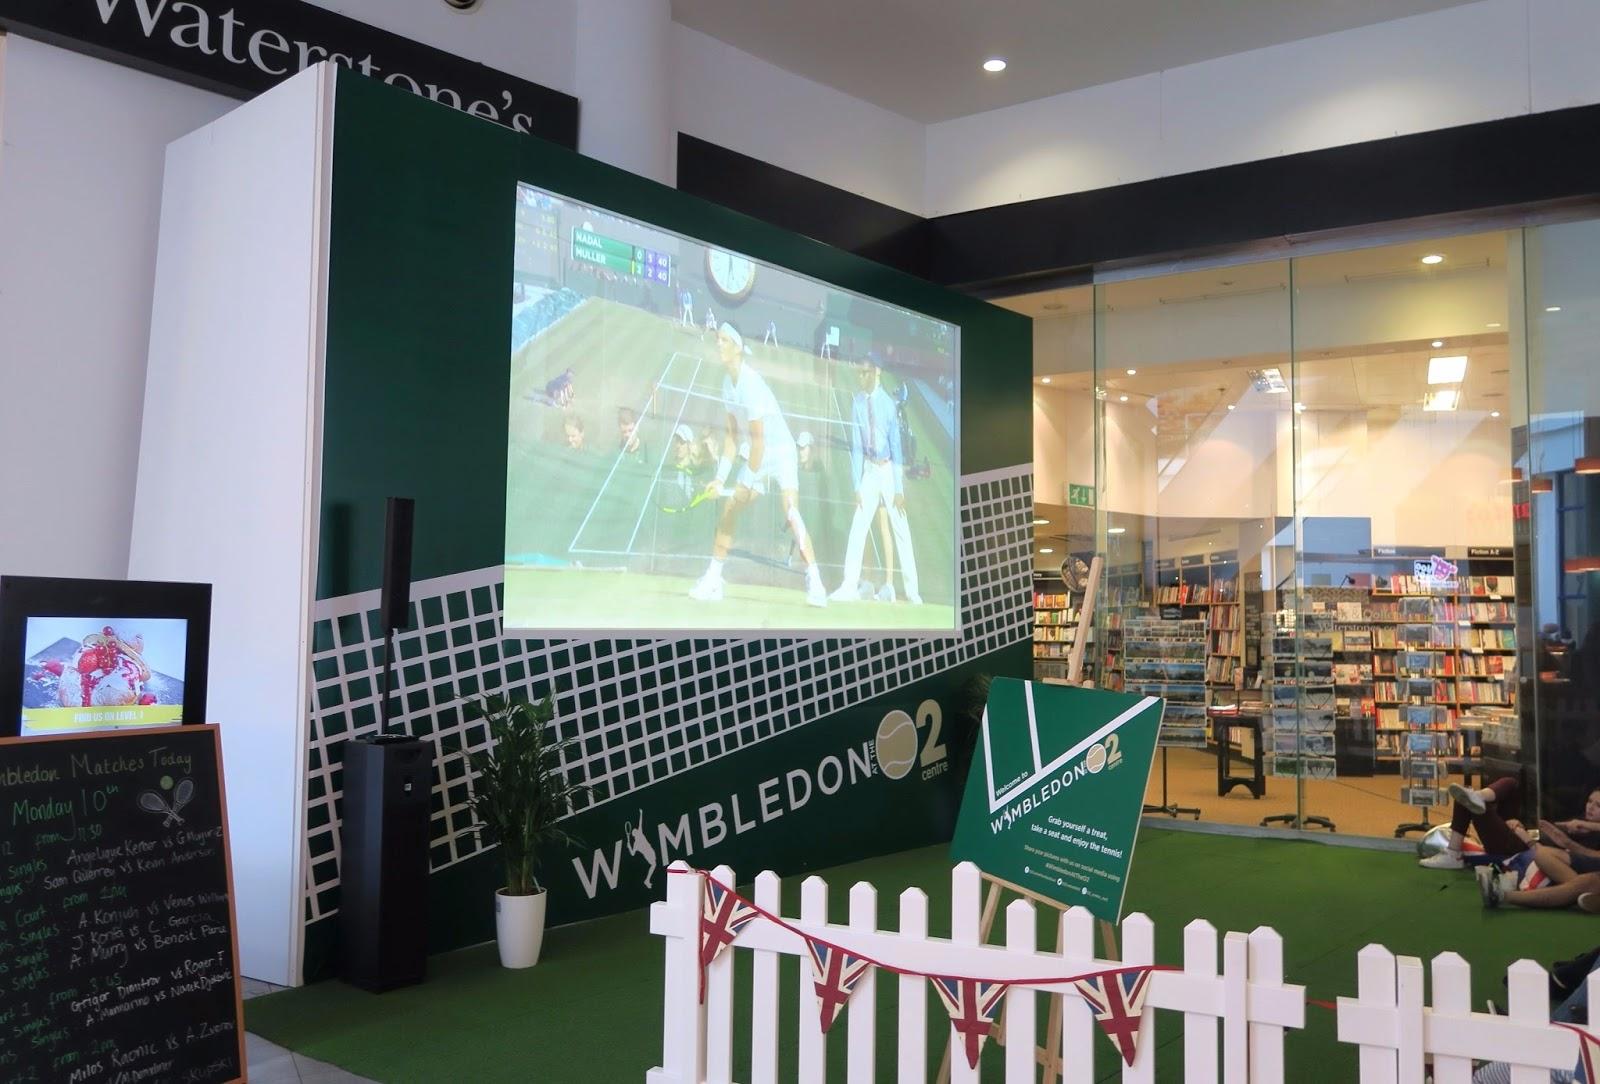 Screening of wimbledon match